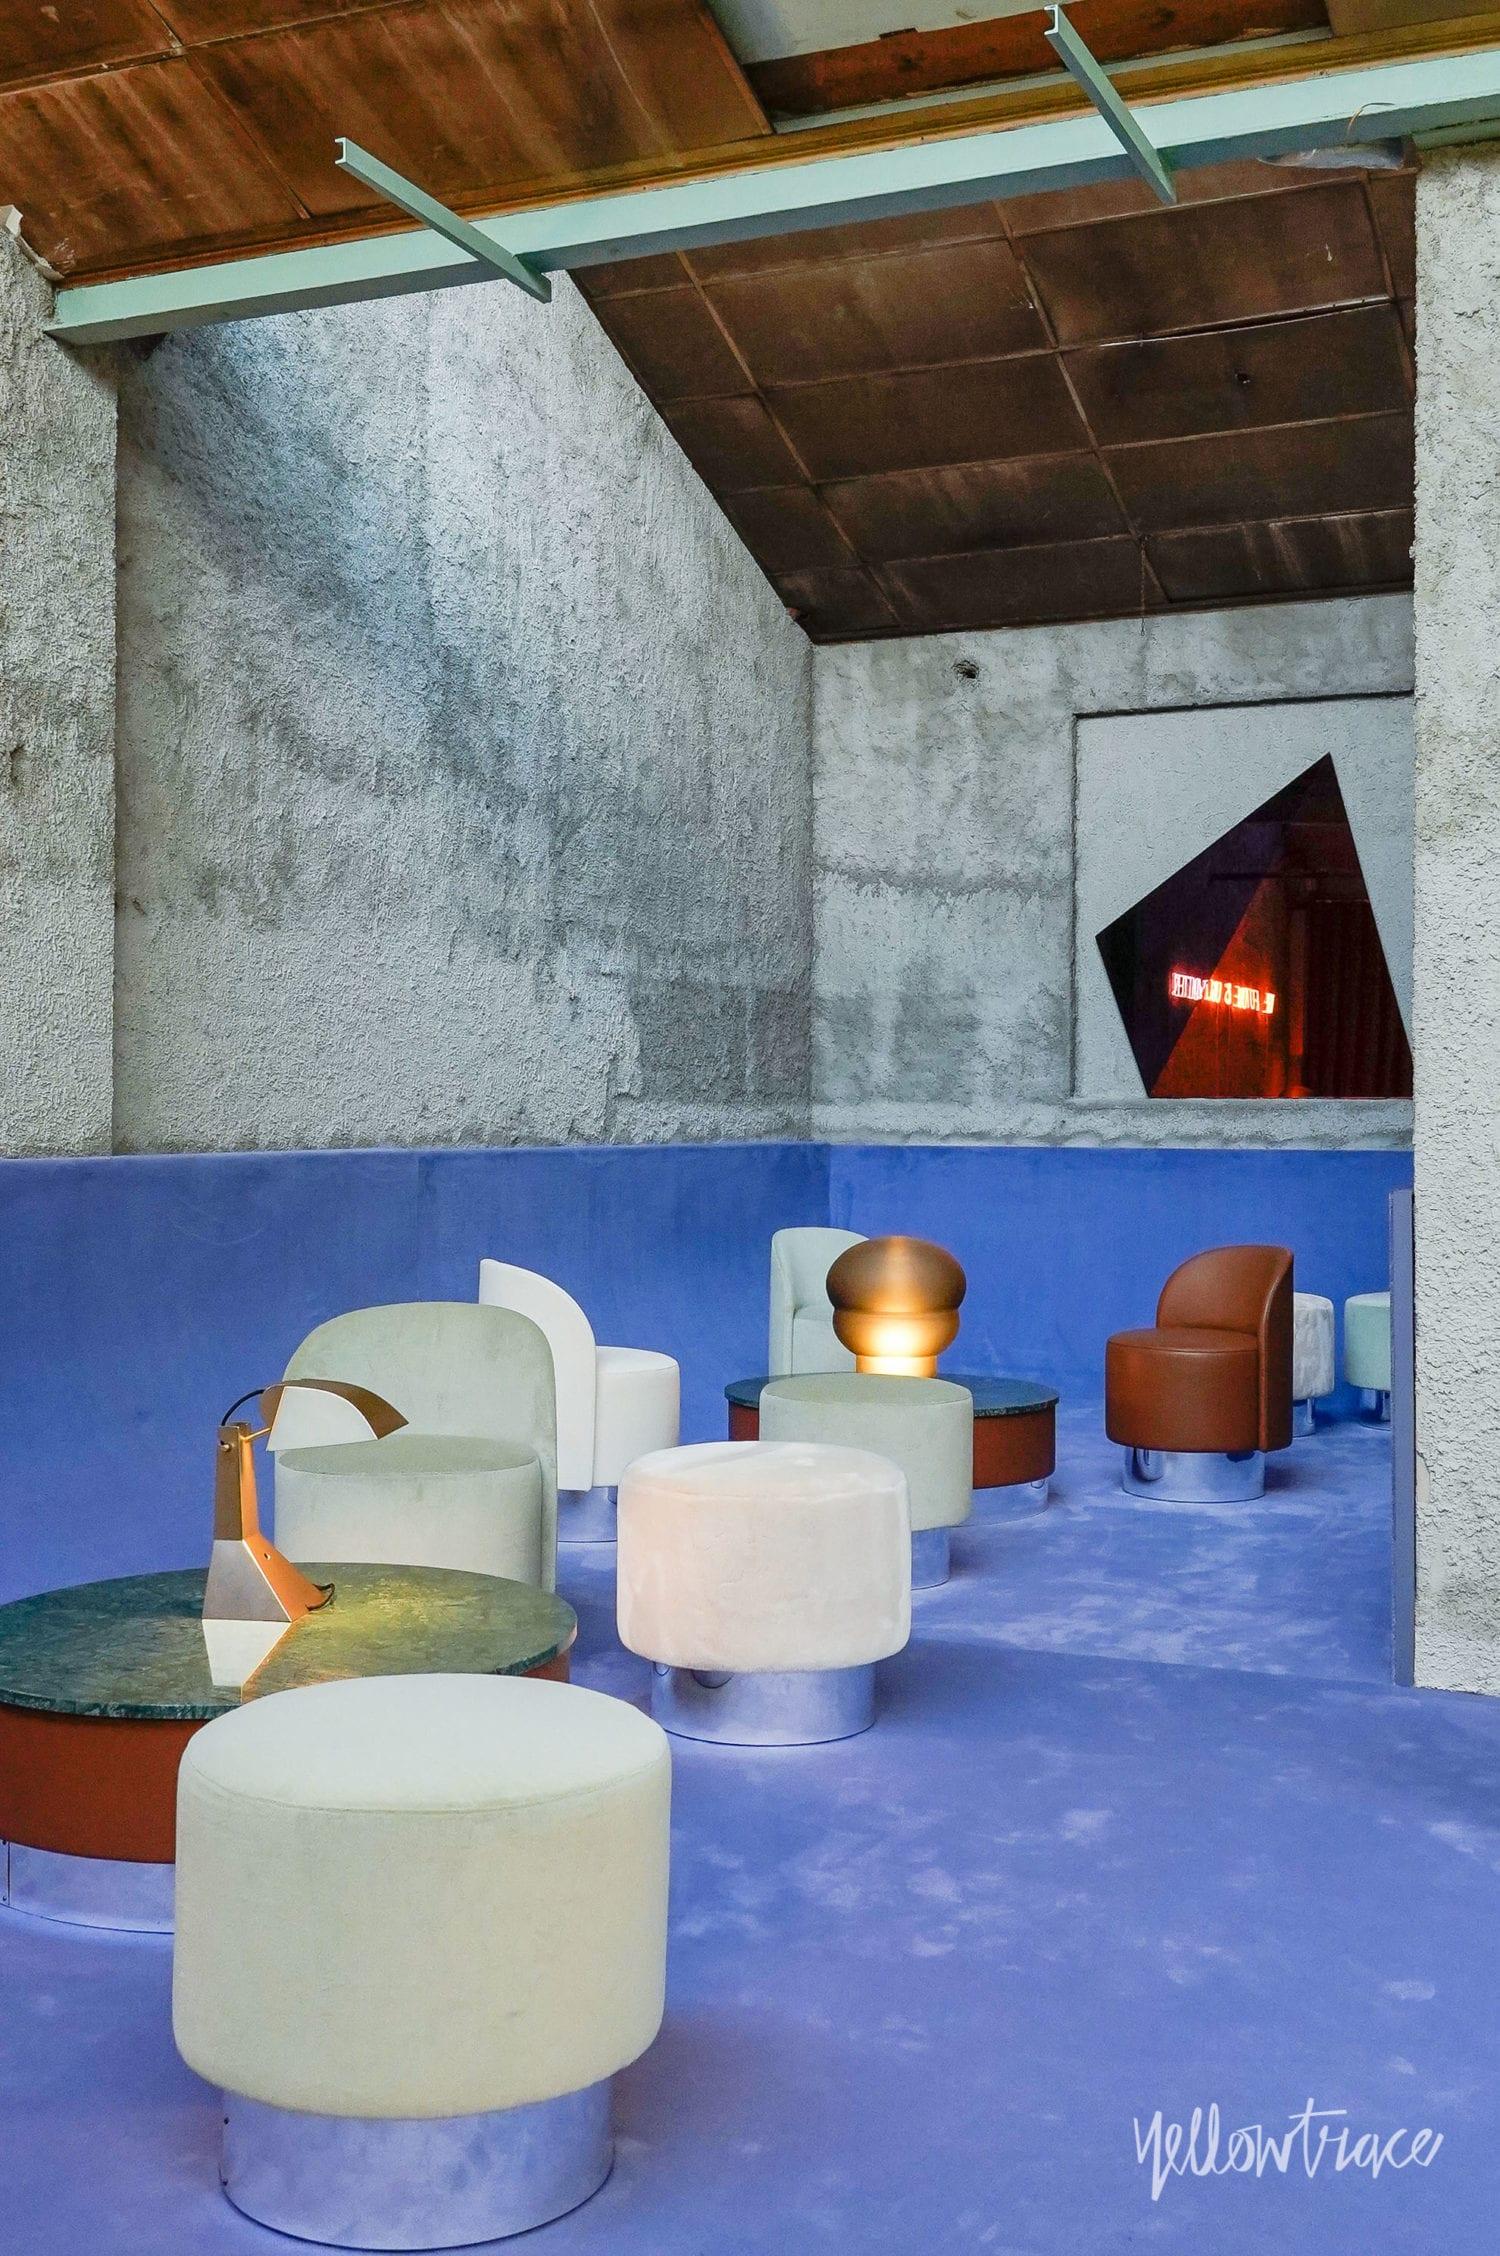 Les Arcanistes Studiopepe At Milan Design Week 2019 Photo Nick Hughes Yellowtrace 20